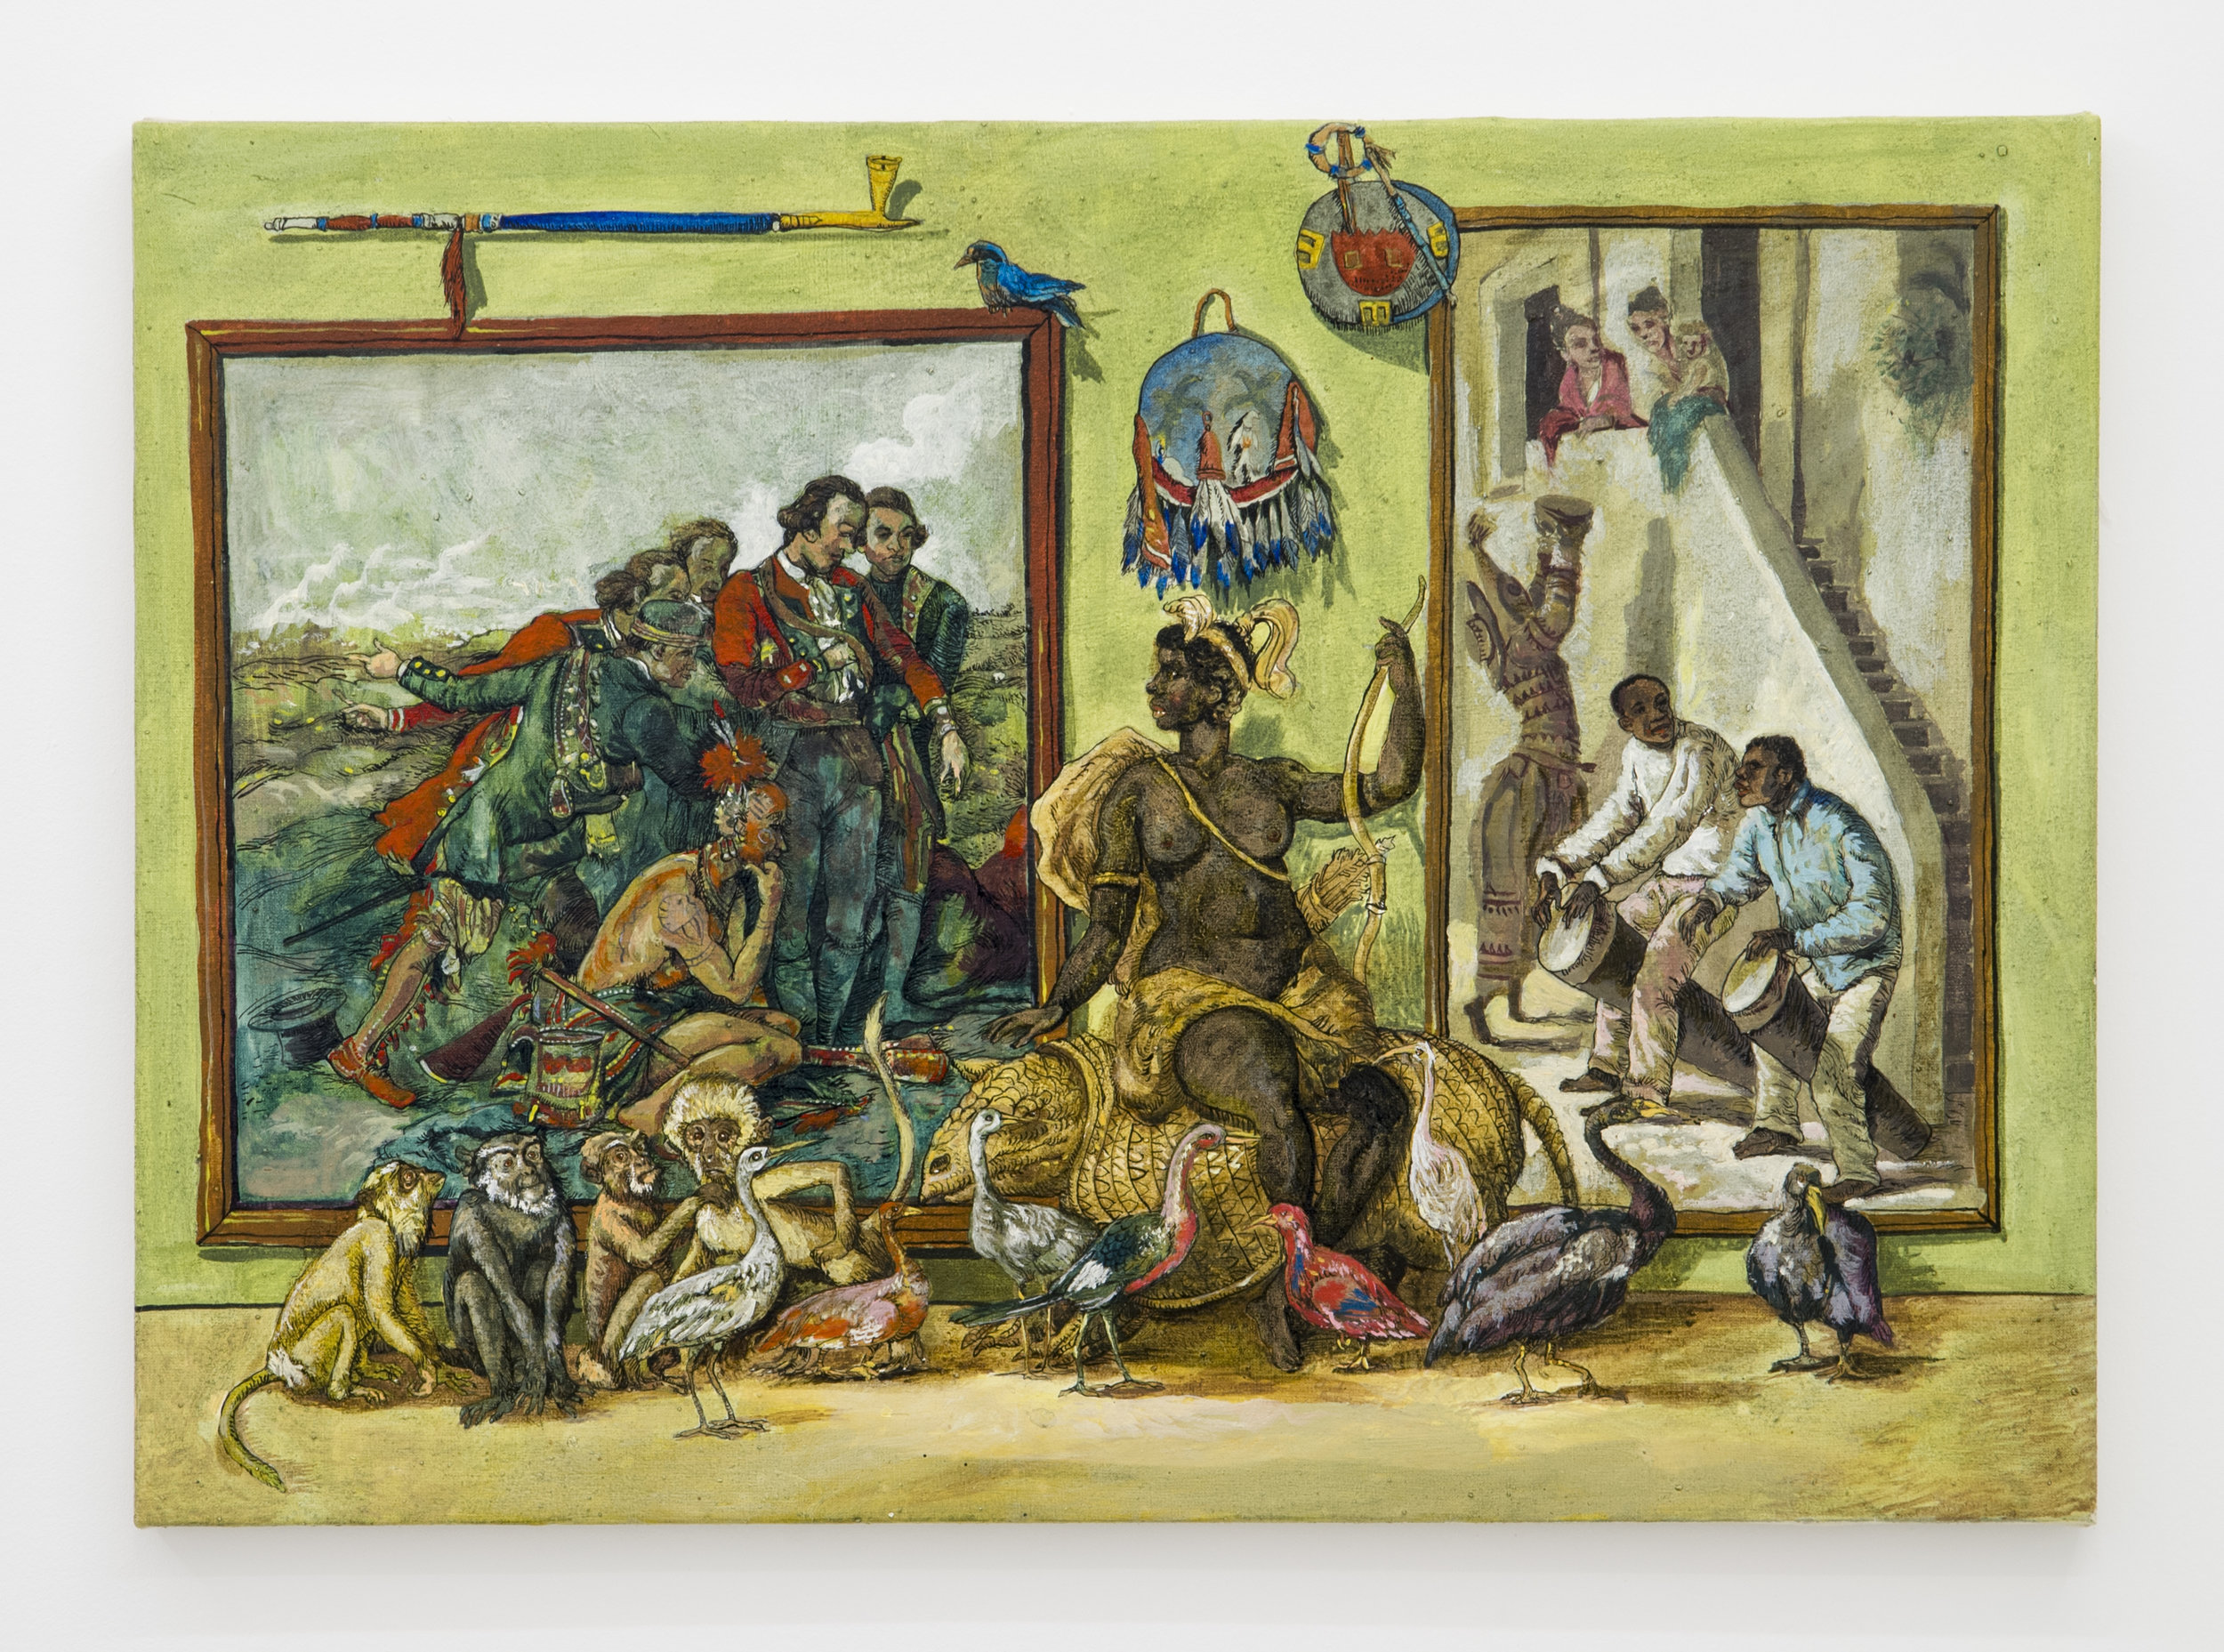 Douglas Pérez Castro, El Buen Salvaje ,2015,Oil on canvas,50 x 70 cm